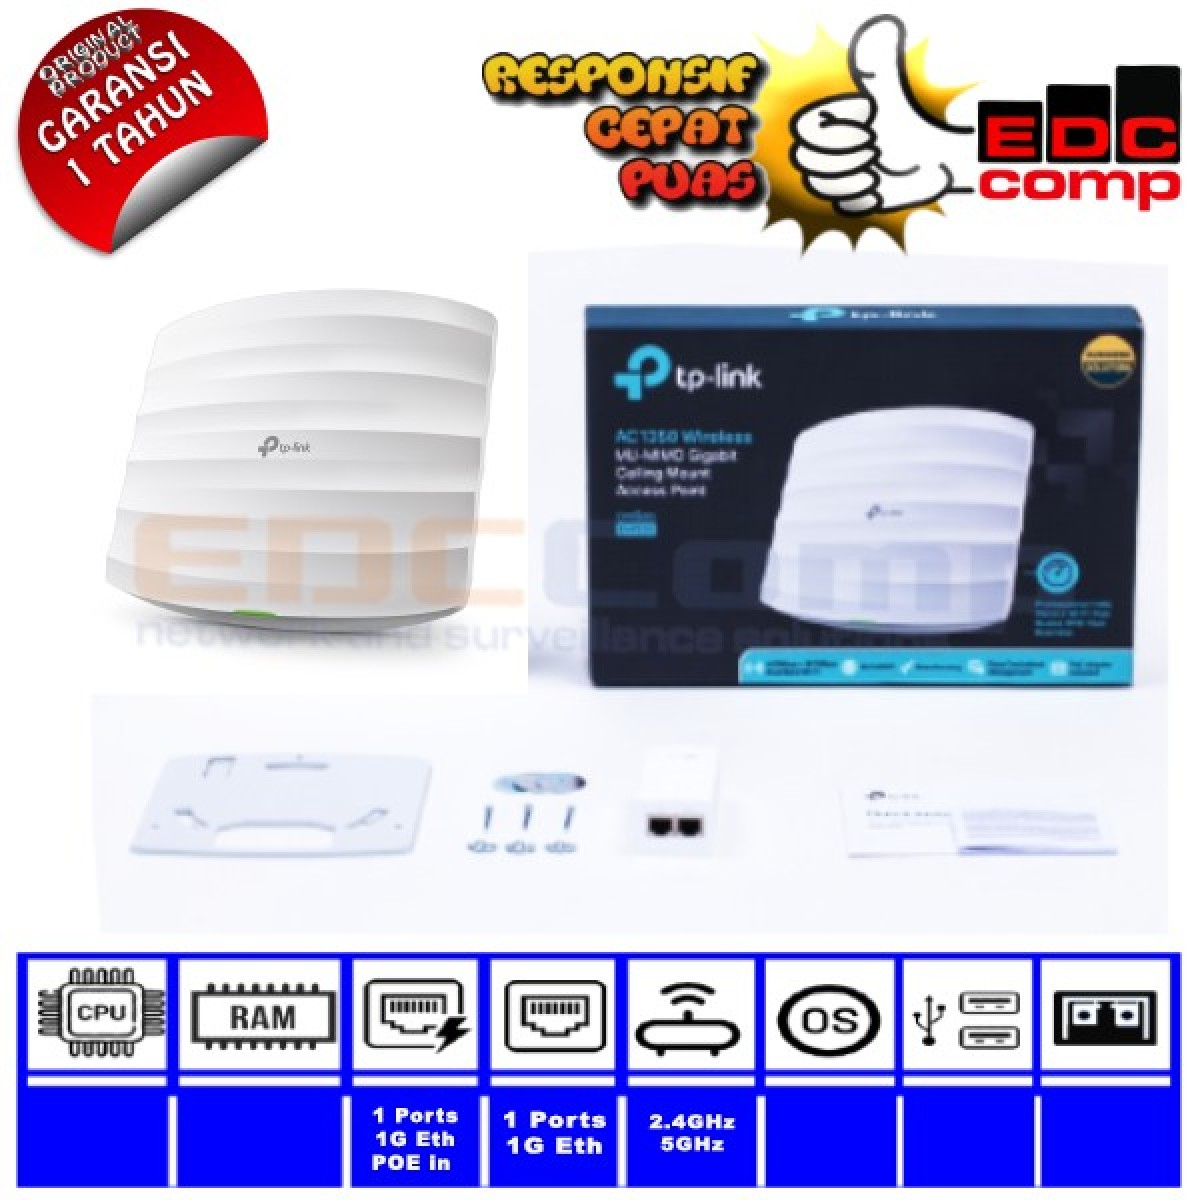 AC1350 Wireless MU-MIMO Gigabit Ceilling AP EAP225-Indoor TPLink - EdcComp